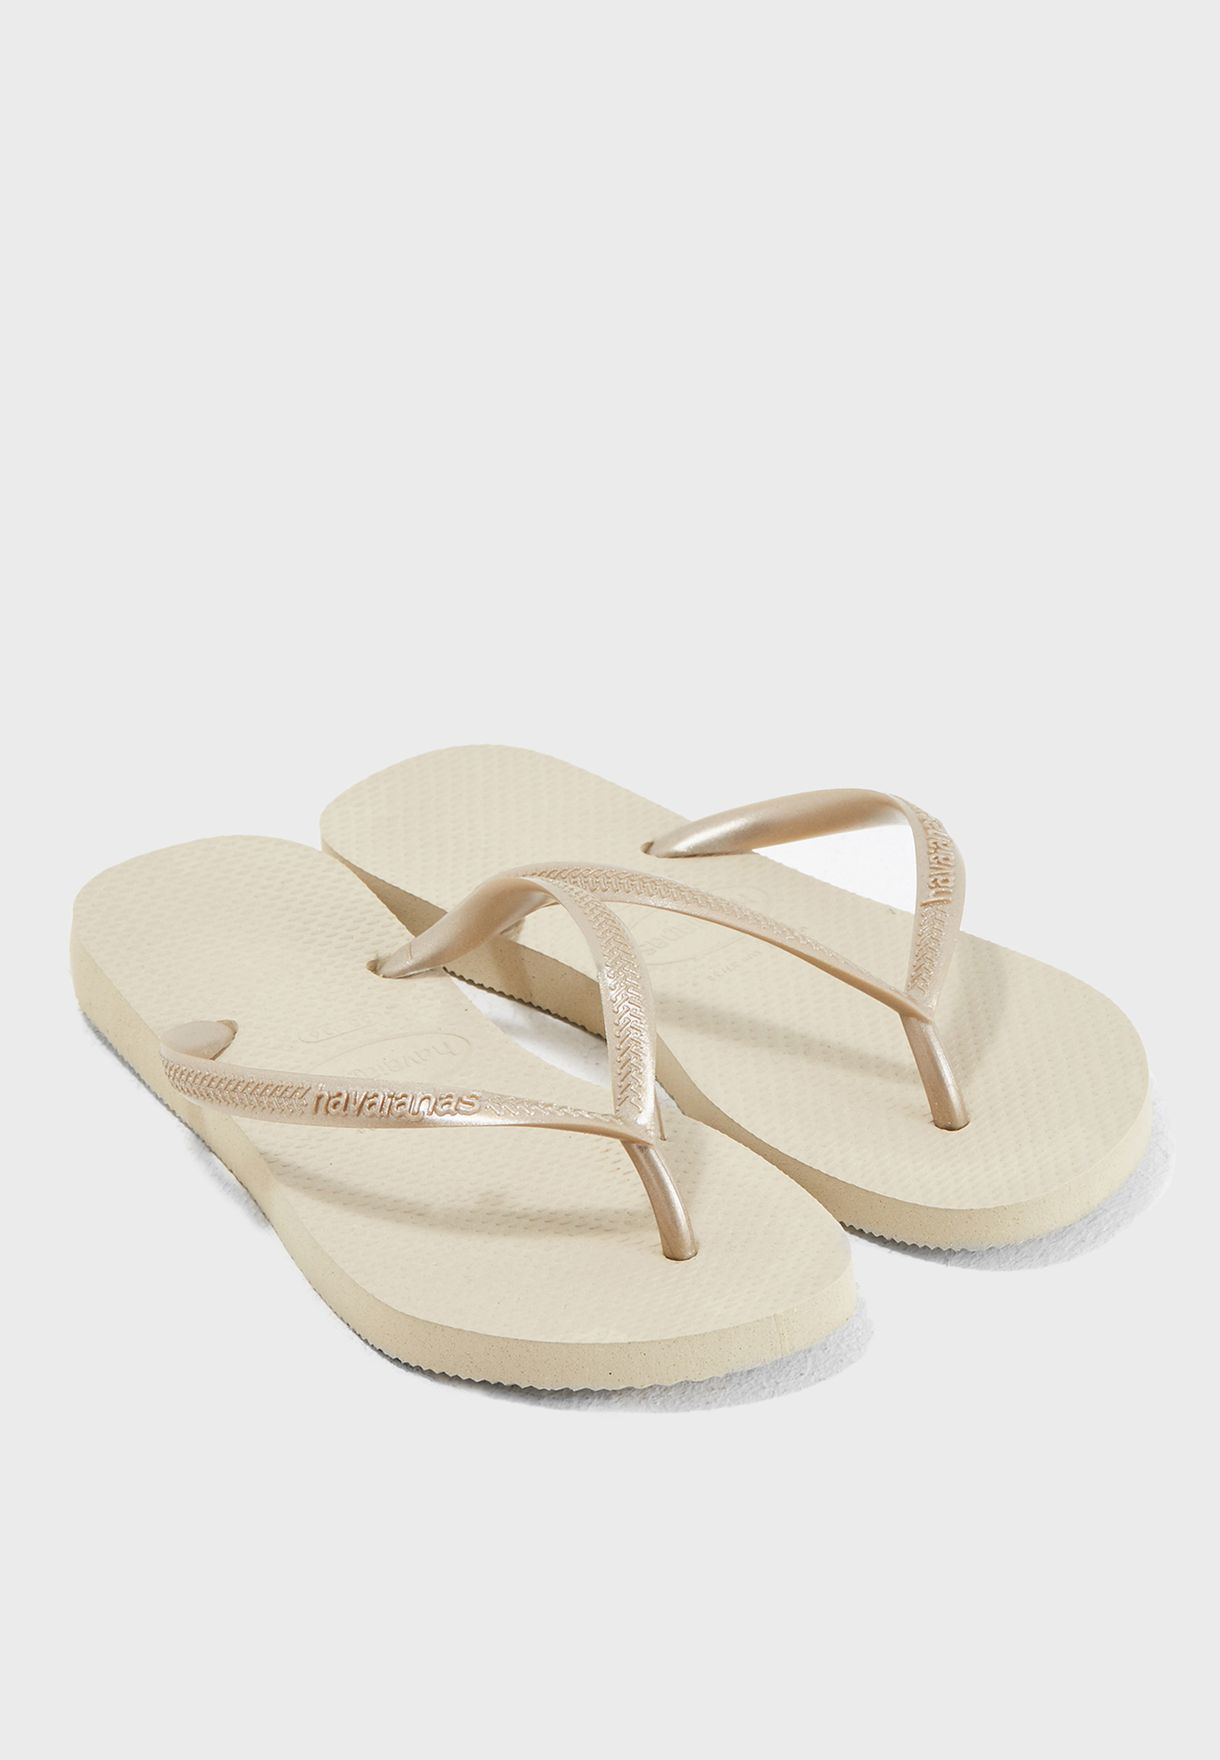 493c303fb Shop Havaianas beige Hav Slim Flip Flops 4000030 for Women in UAE ...